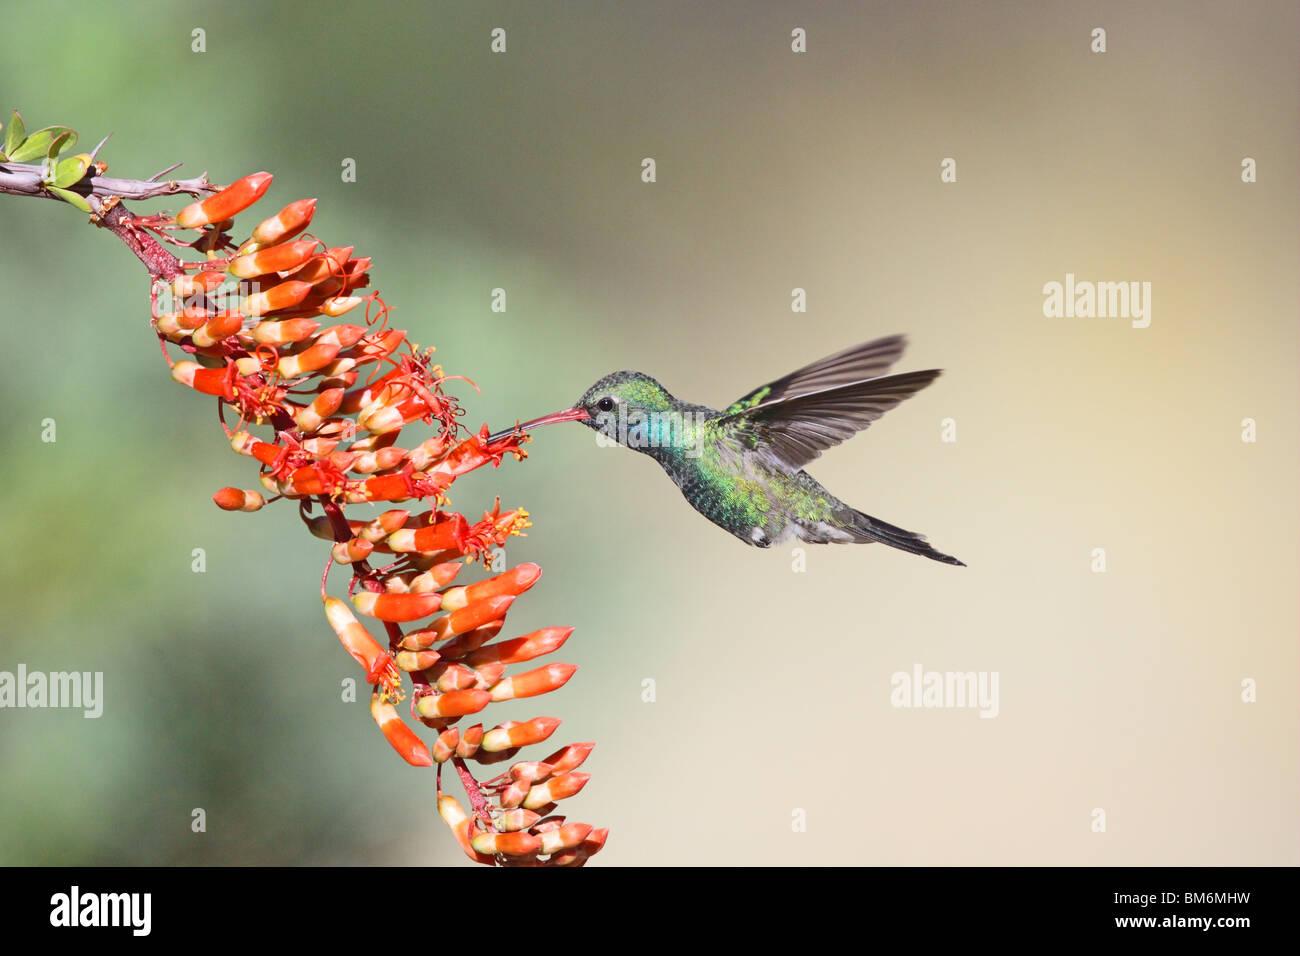 Amplia facturó Colibrí macho adulto en Ocotillo flores. Foto de stock